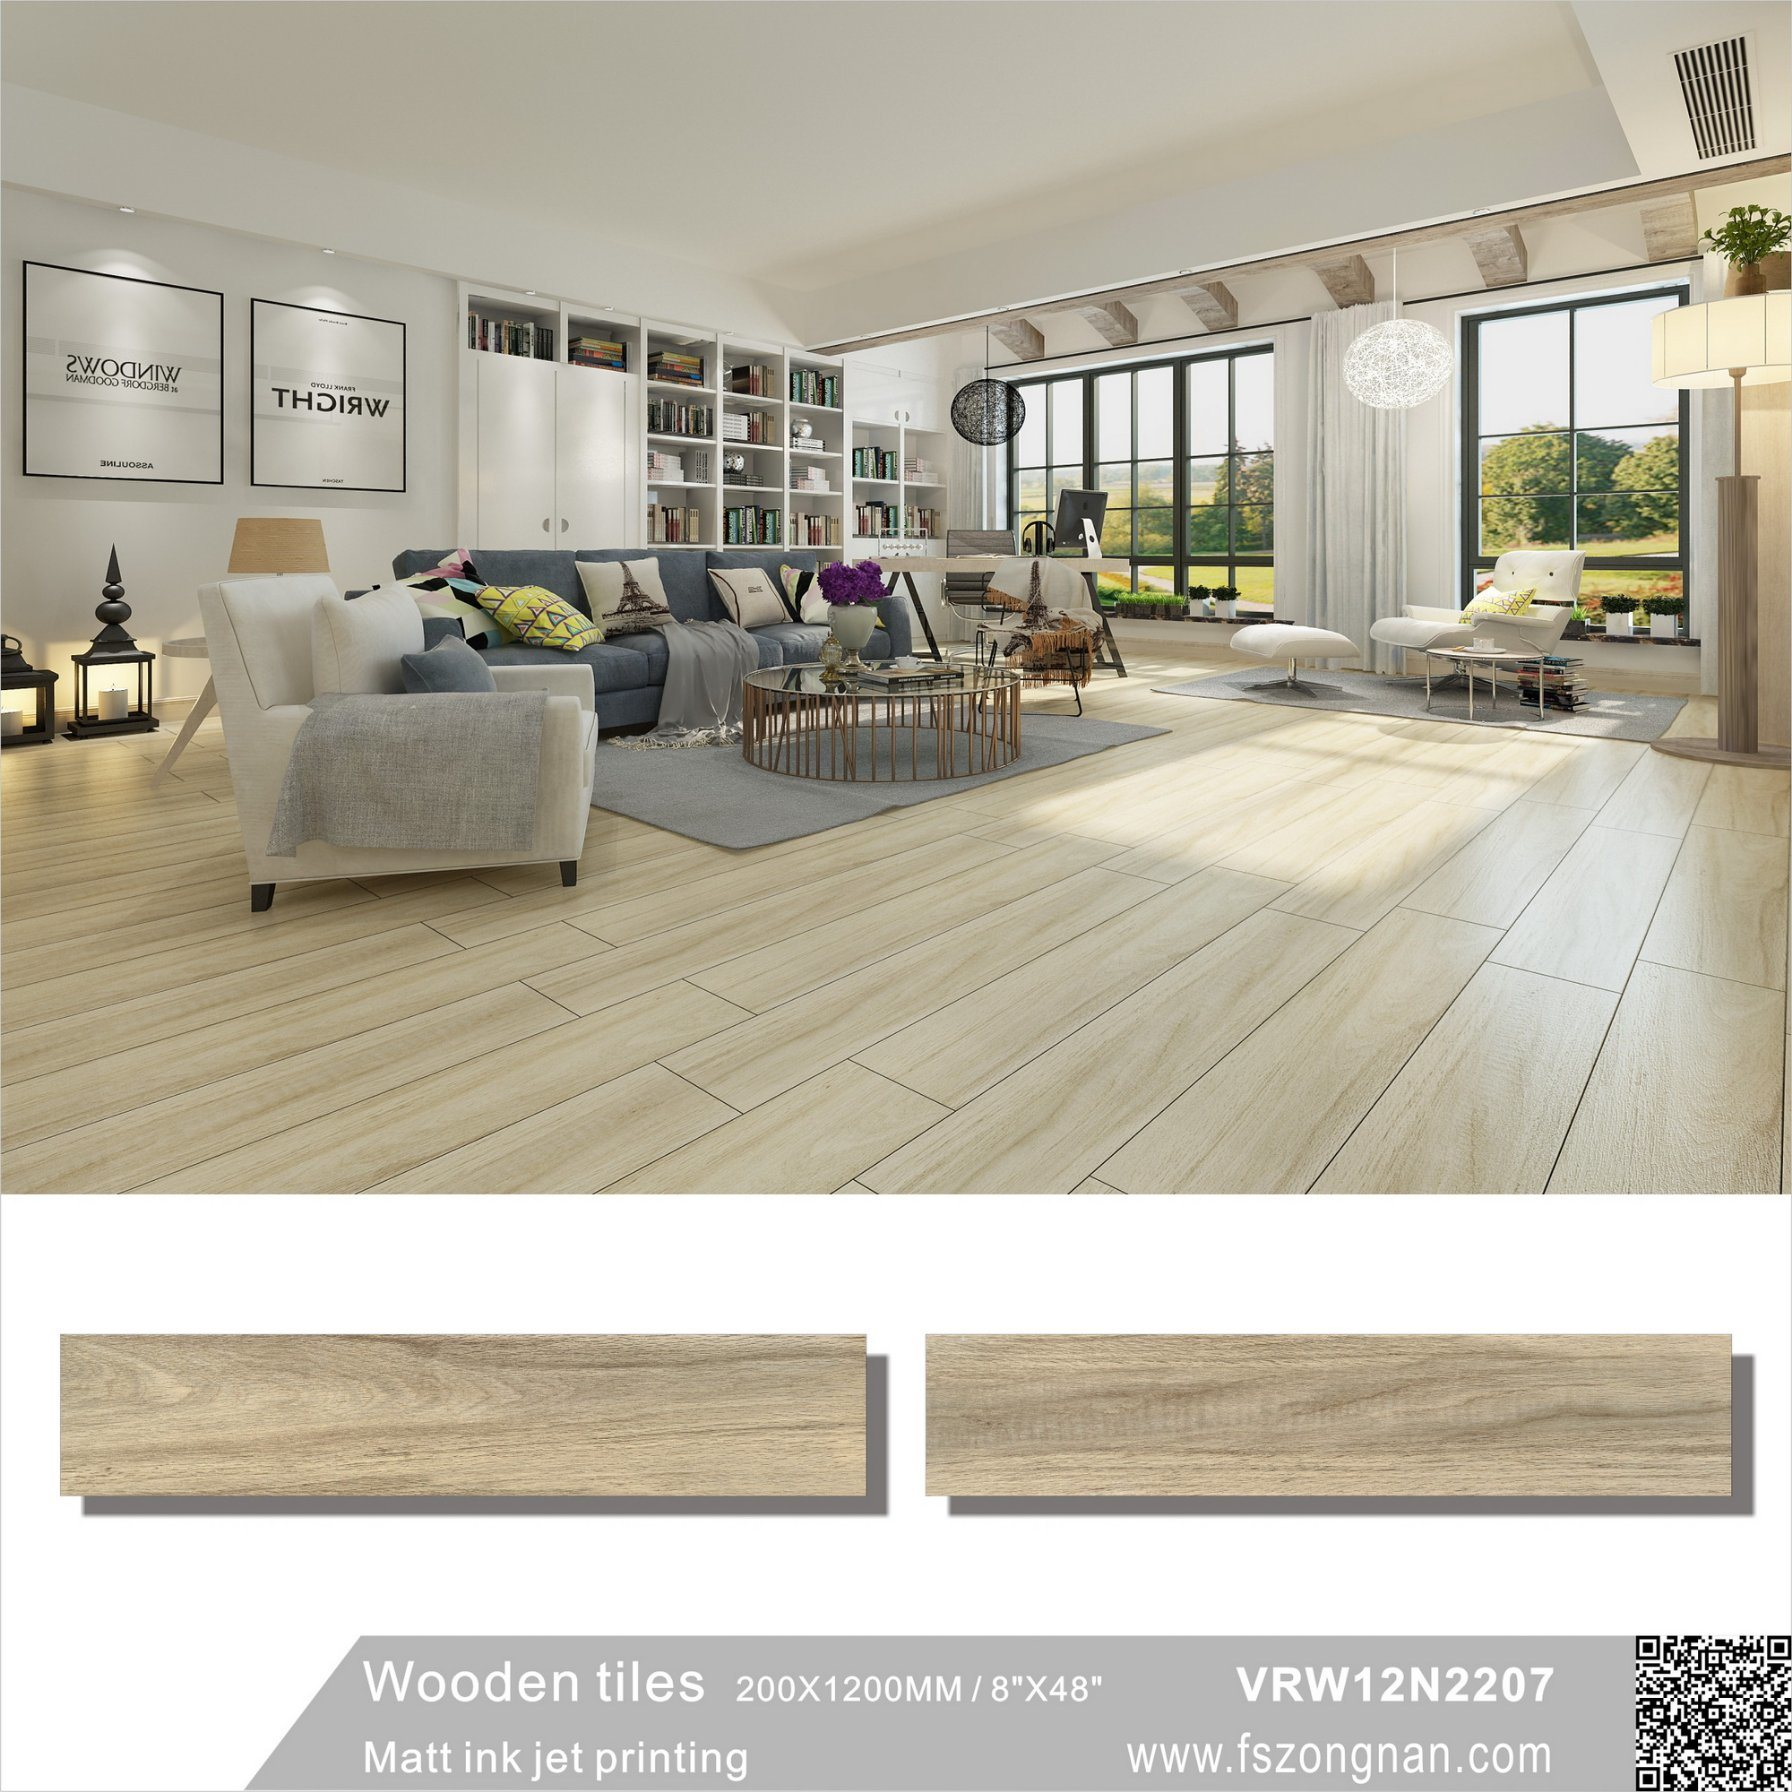 China Building Material Wooden Porcelain Floor Inside or Outside ...